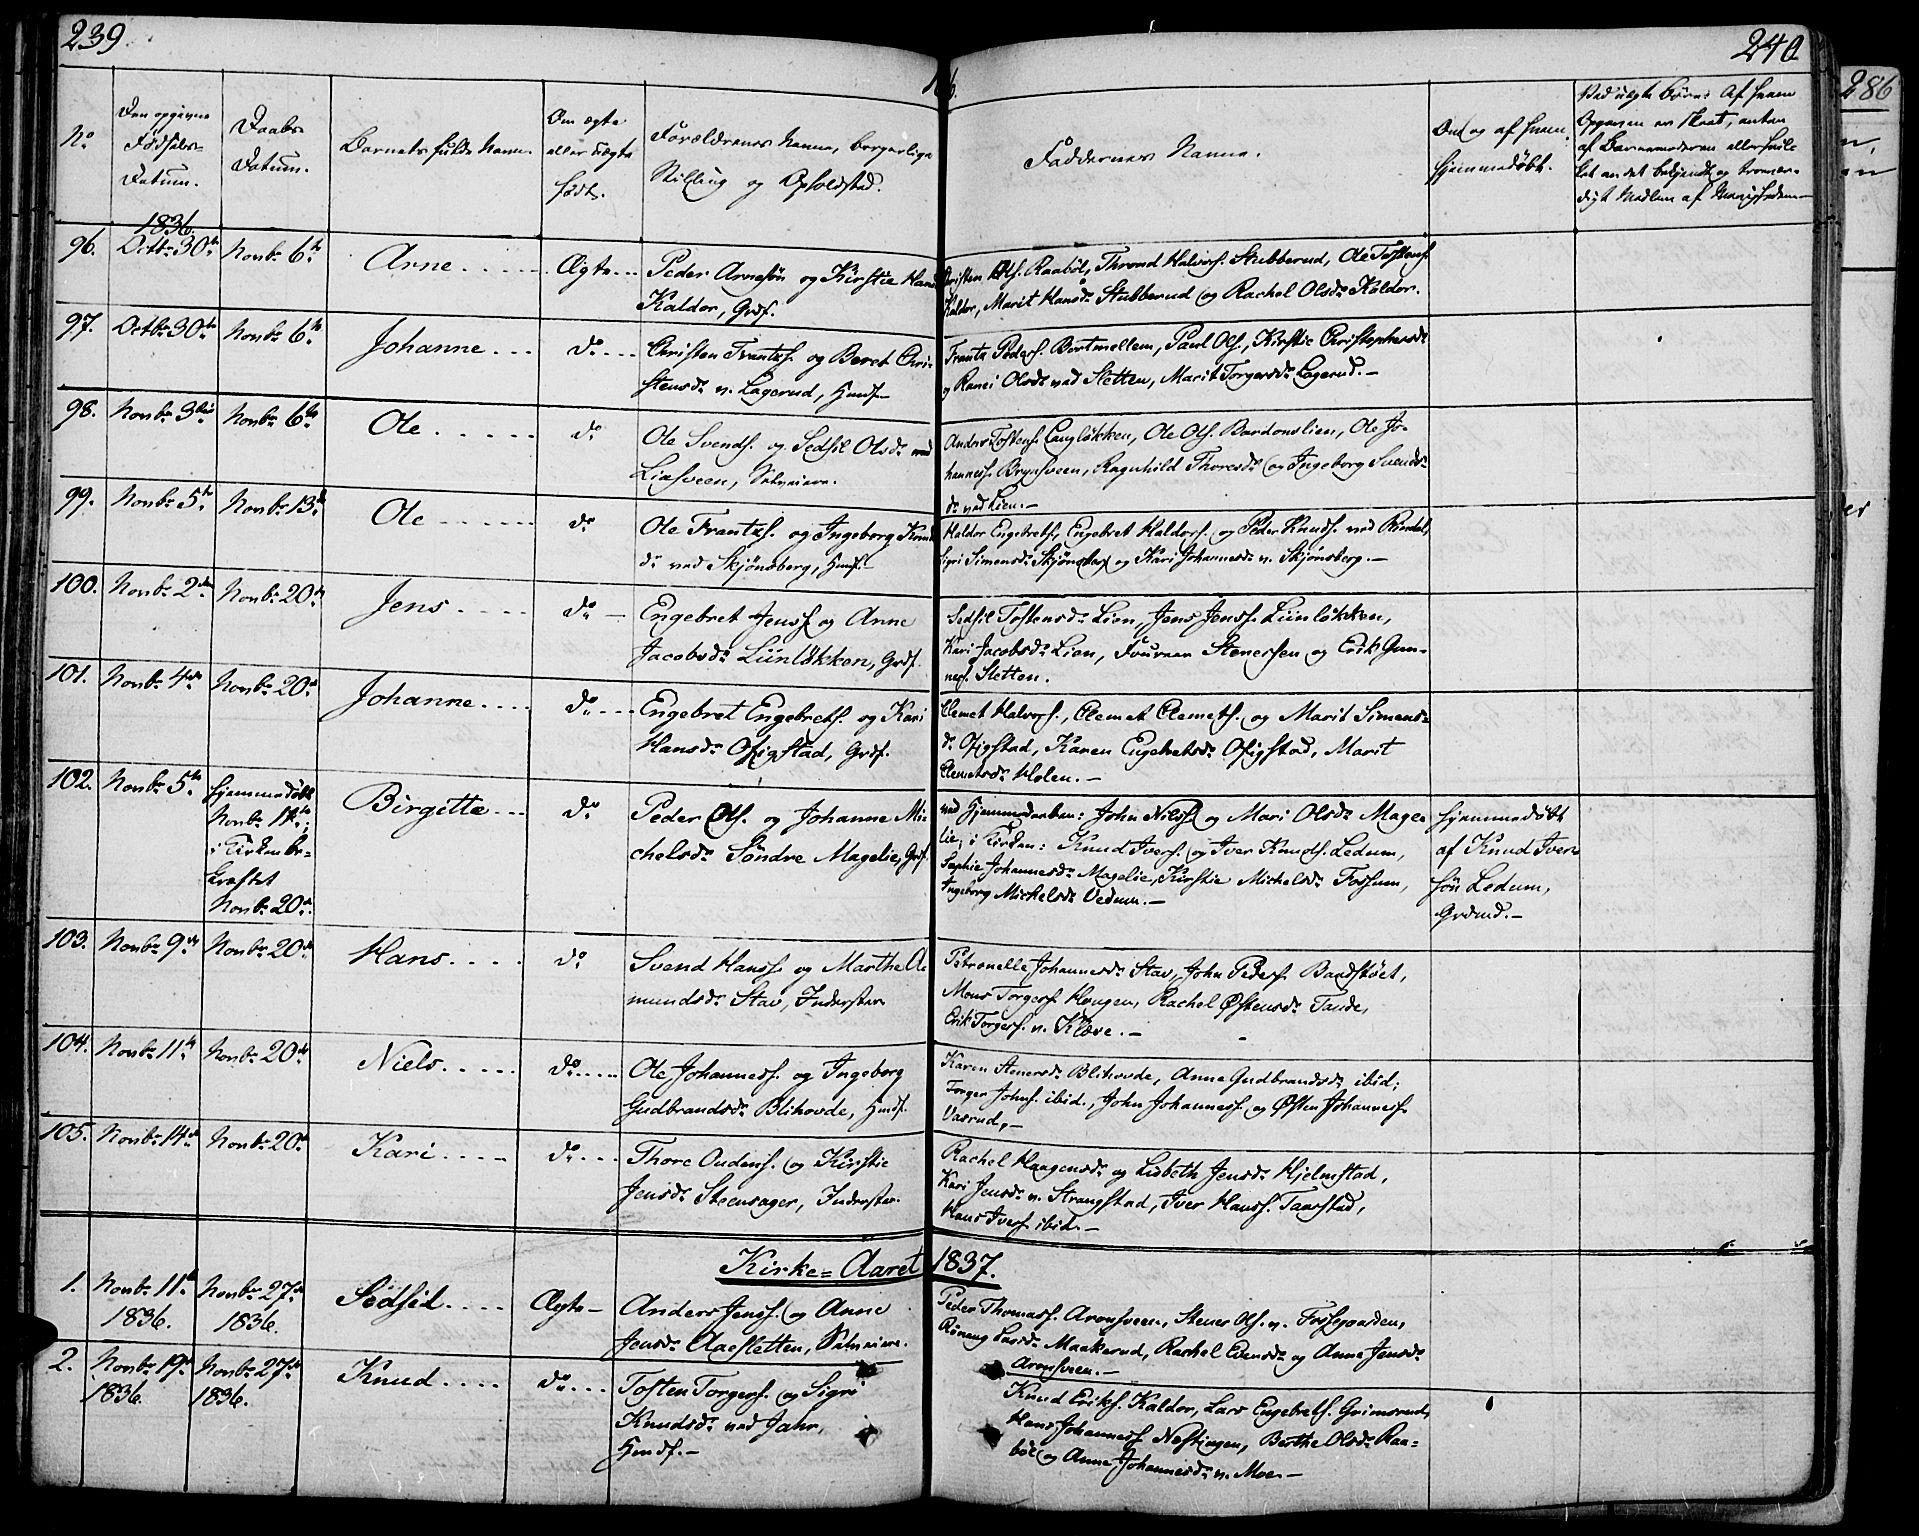 SAH, Øyer prestekontor, Ministerialbok nr. 4, 1824-1841, s. 239-240